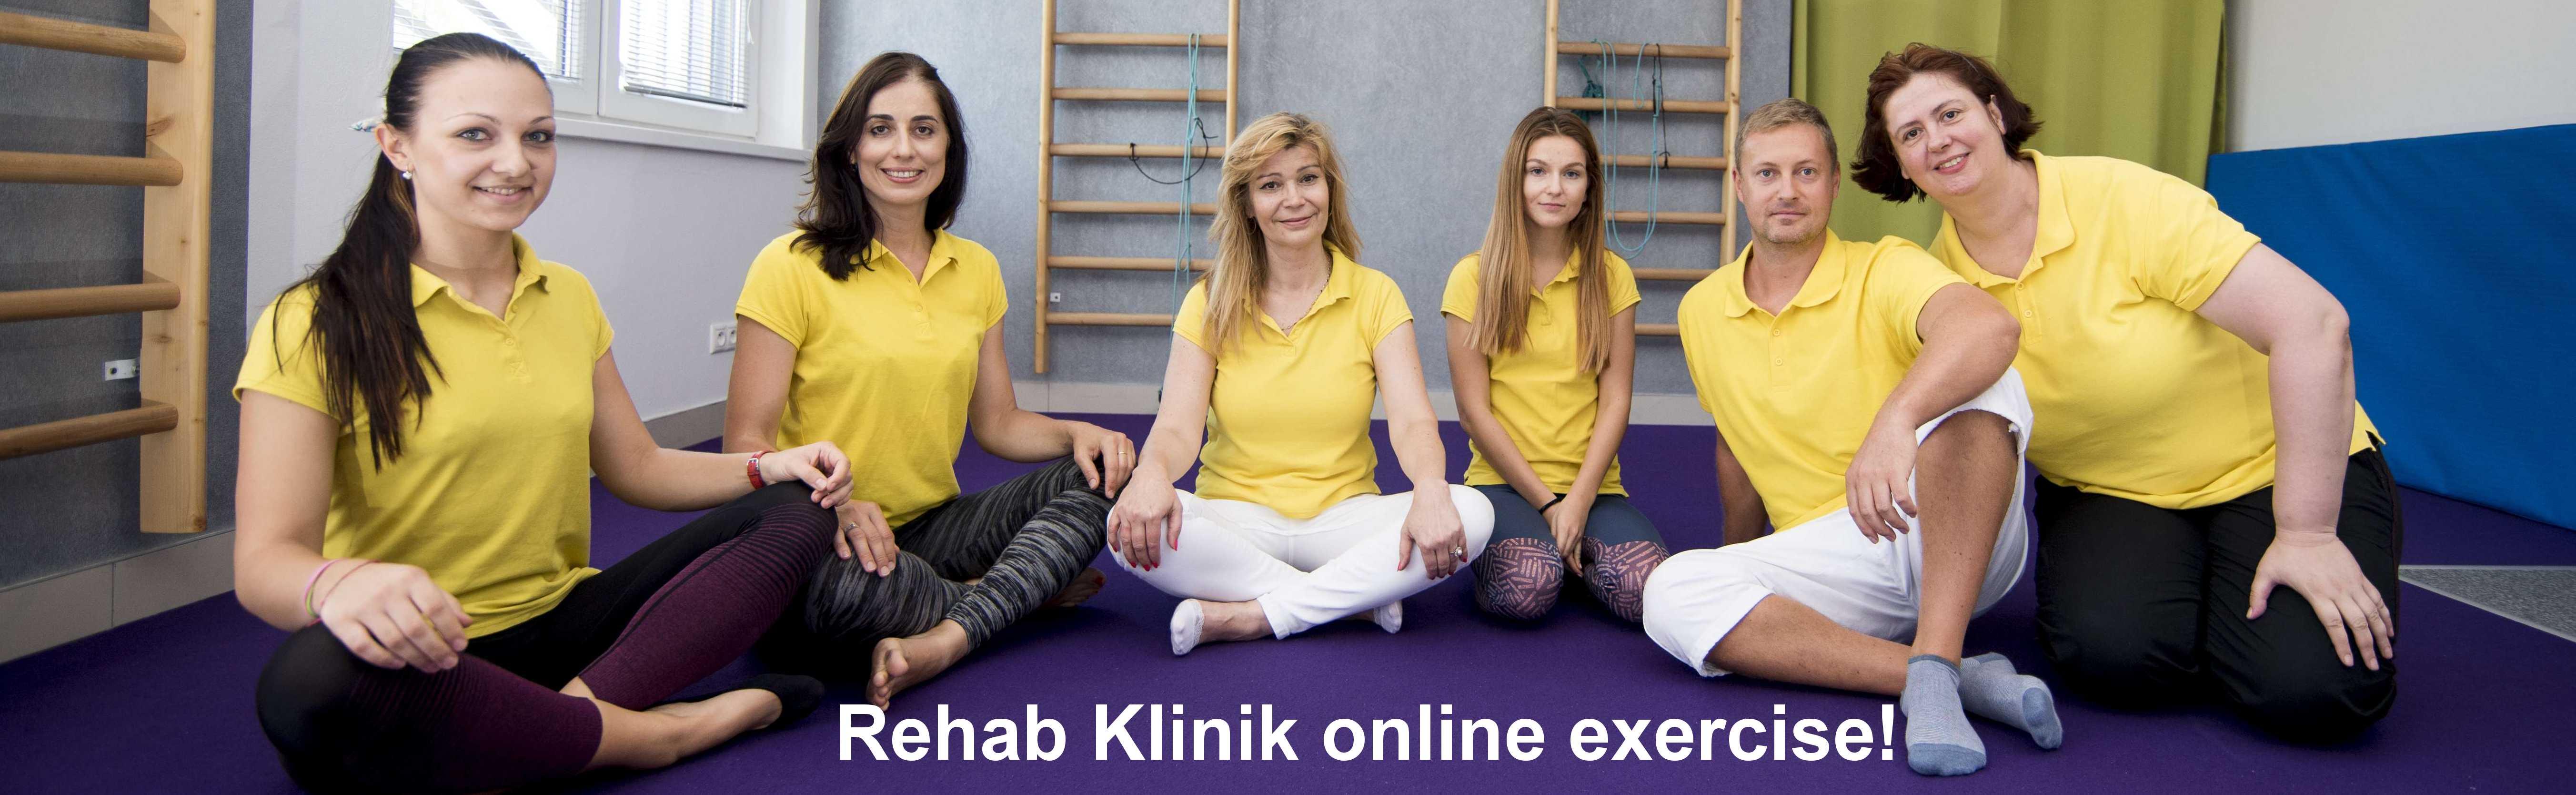 Online cvicenie s fyzioterapeutom